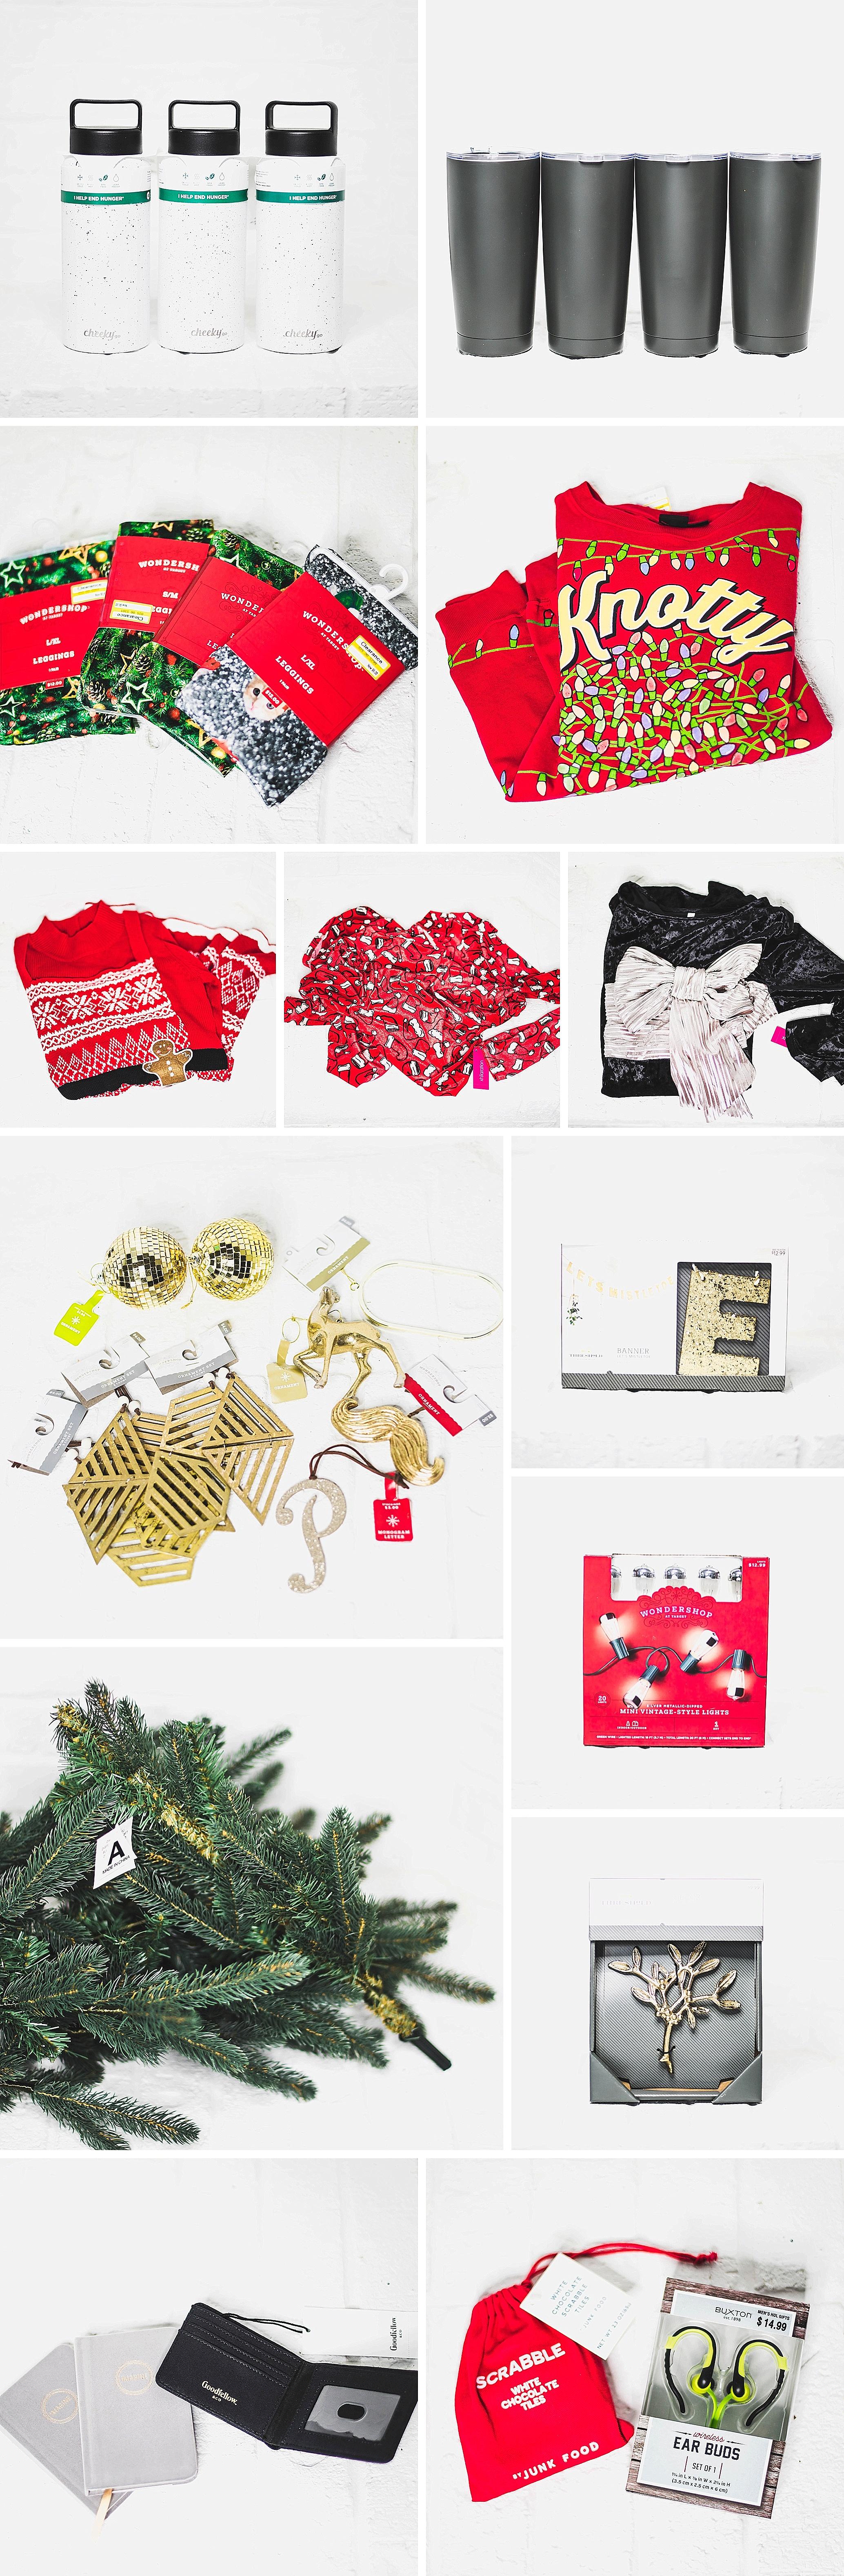 Target Christmas Clearance Haul